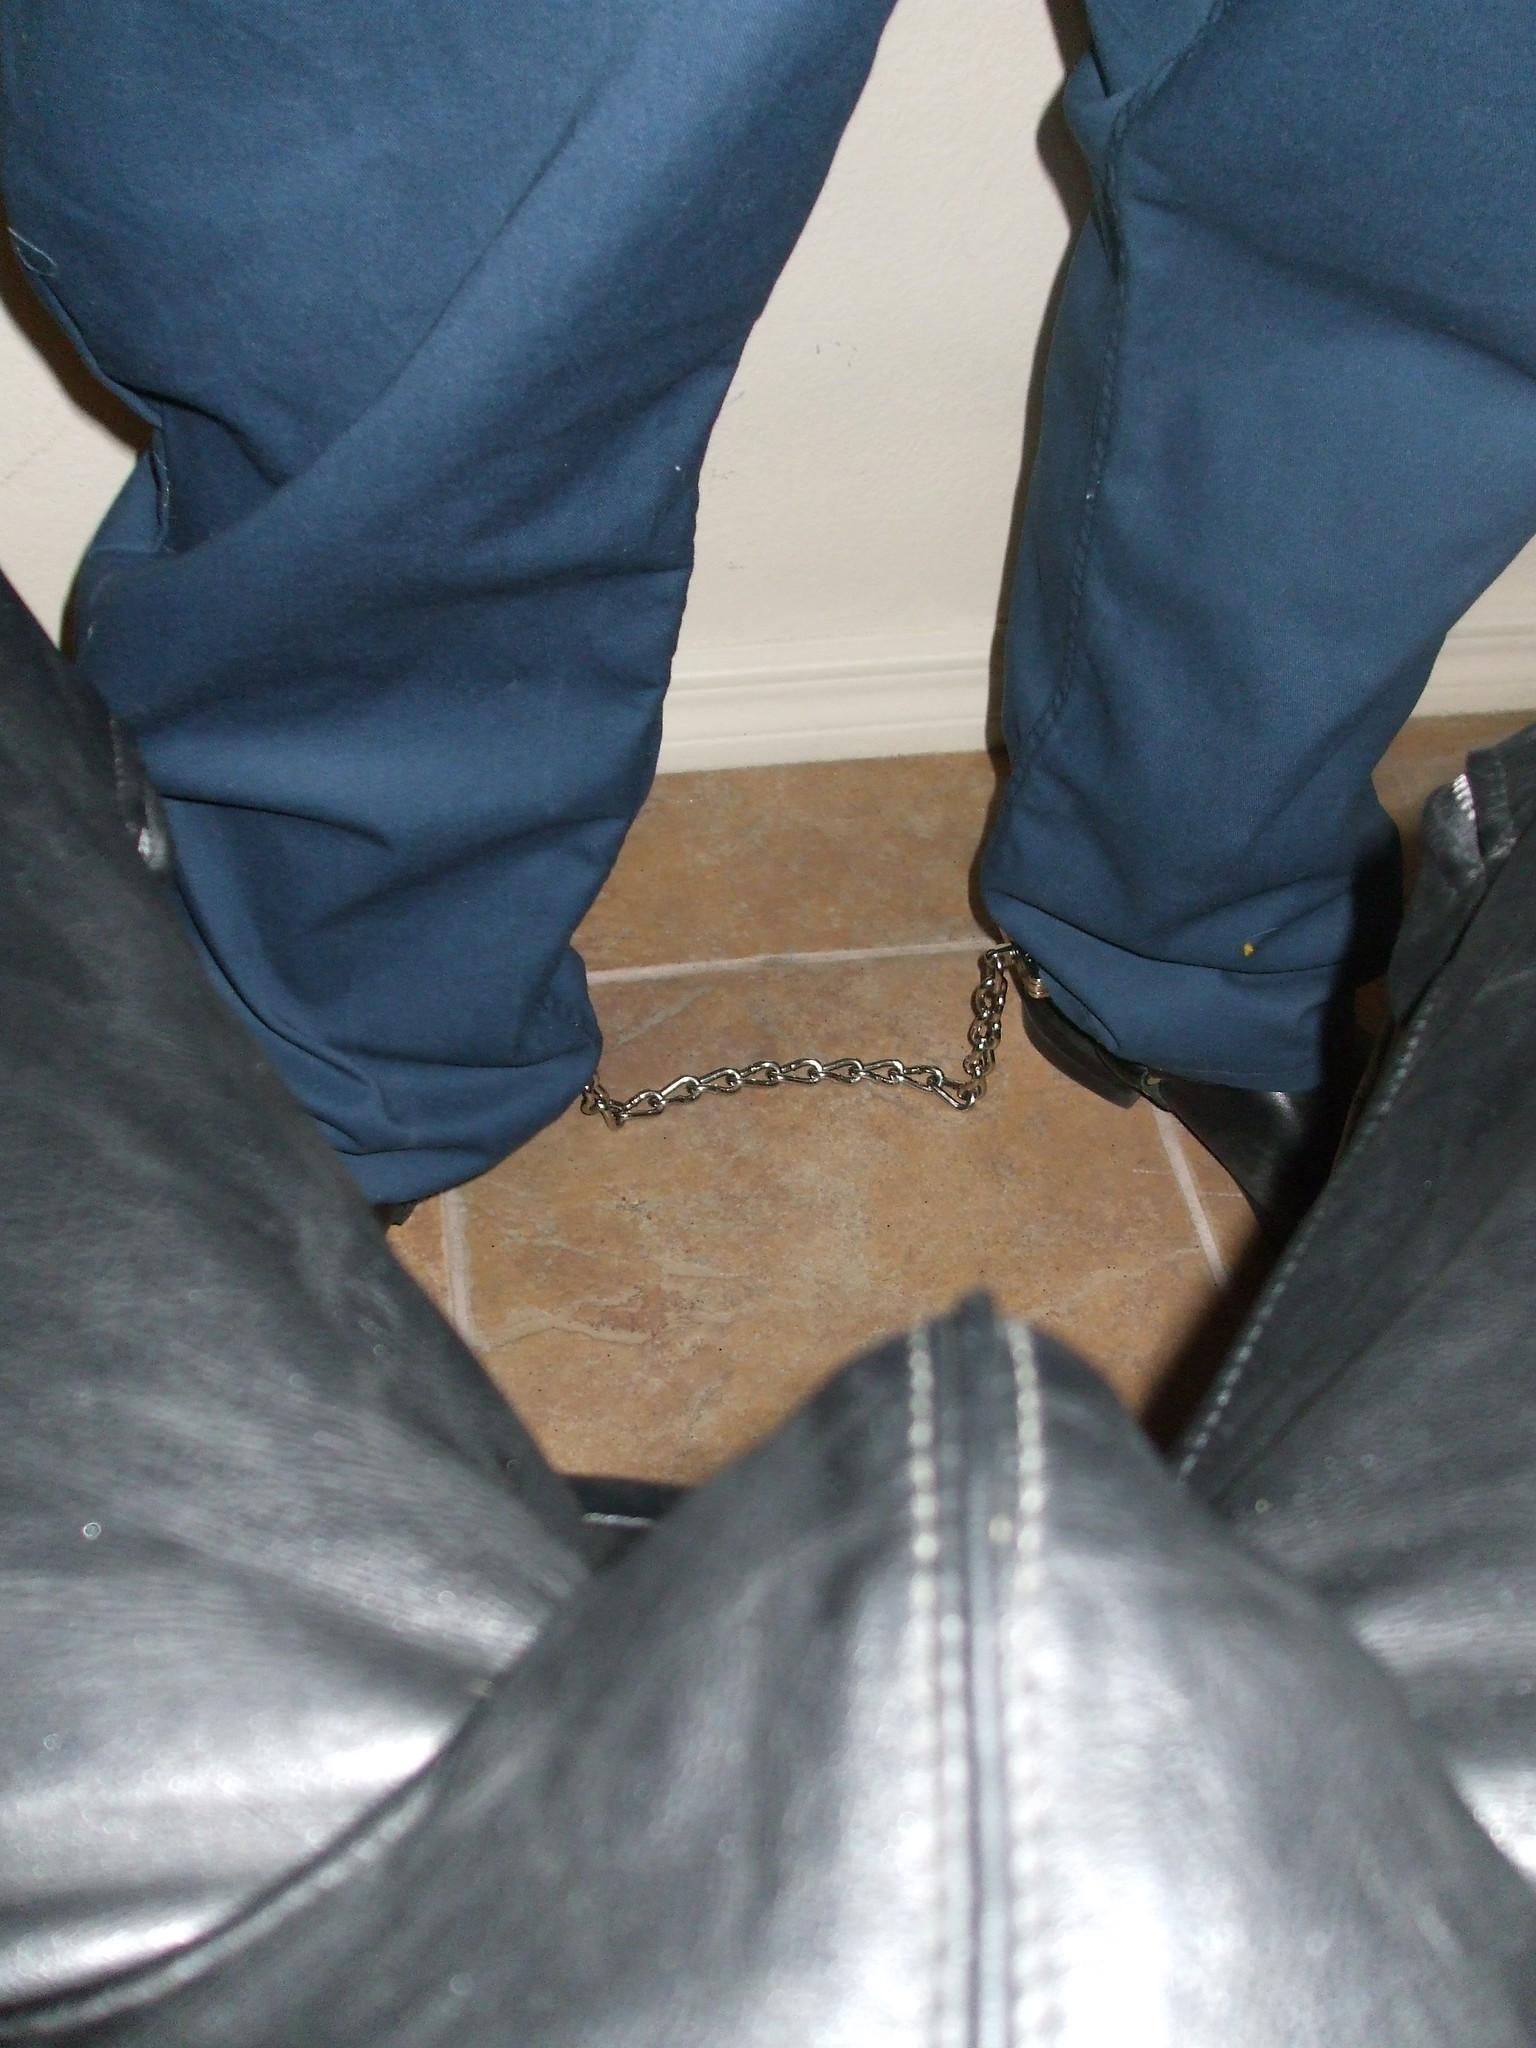 leather bondage gratis datingsidor